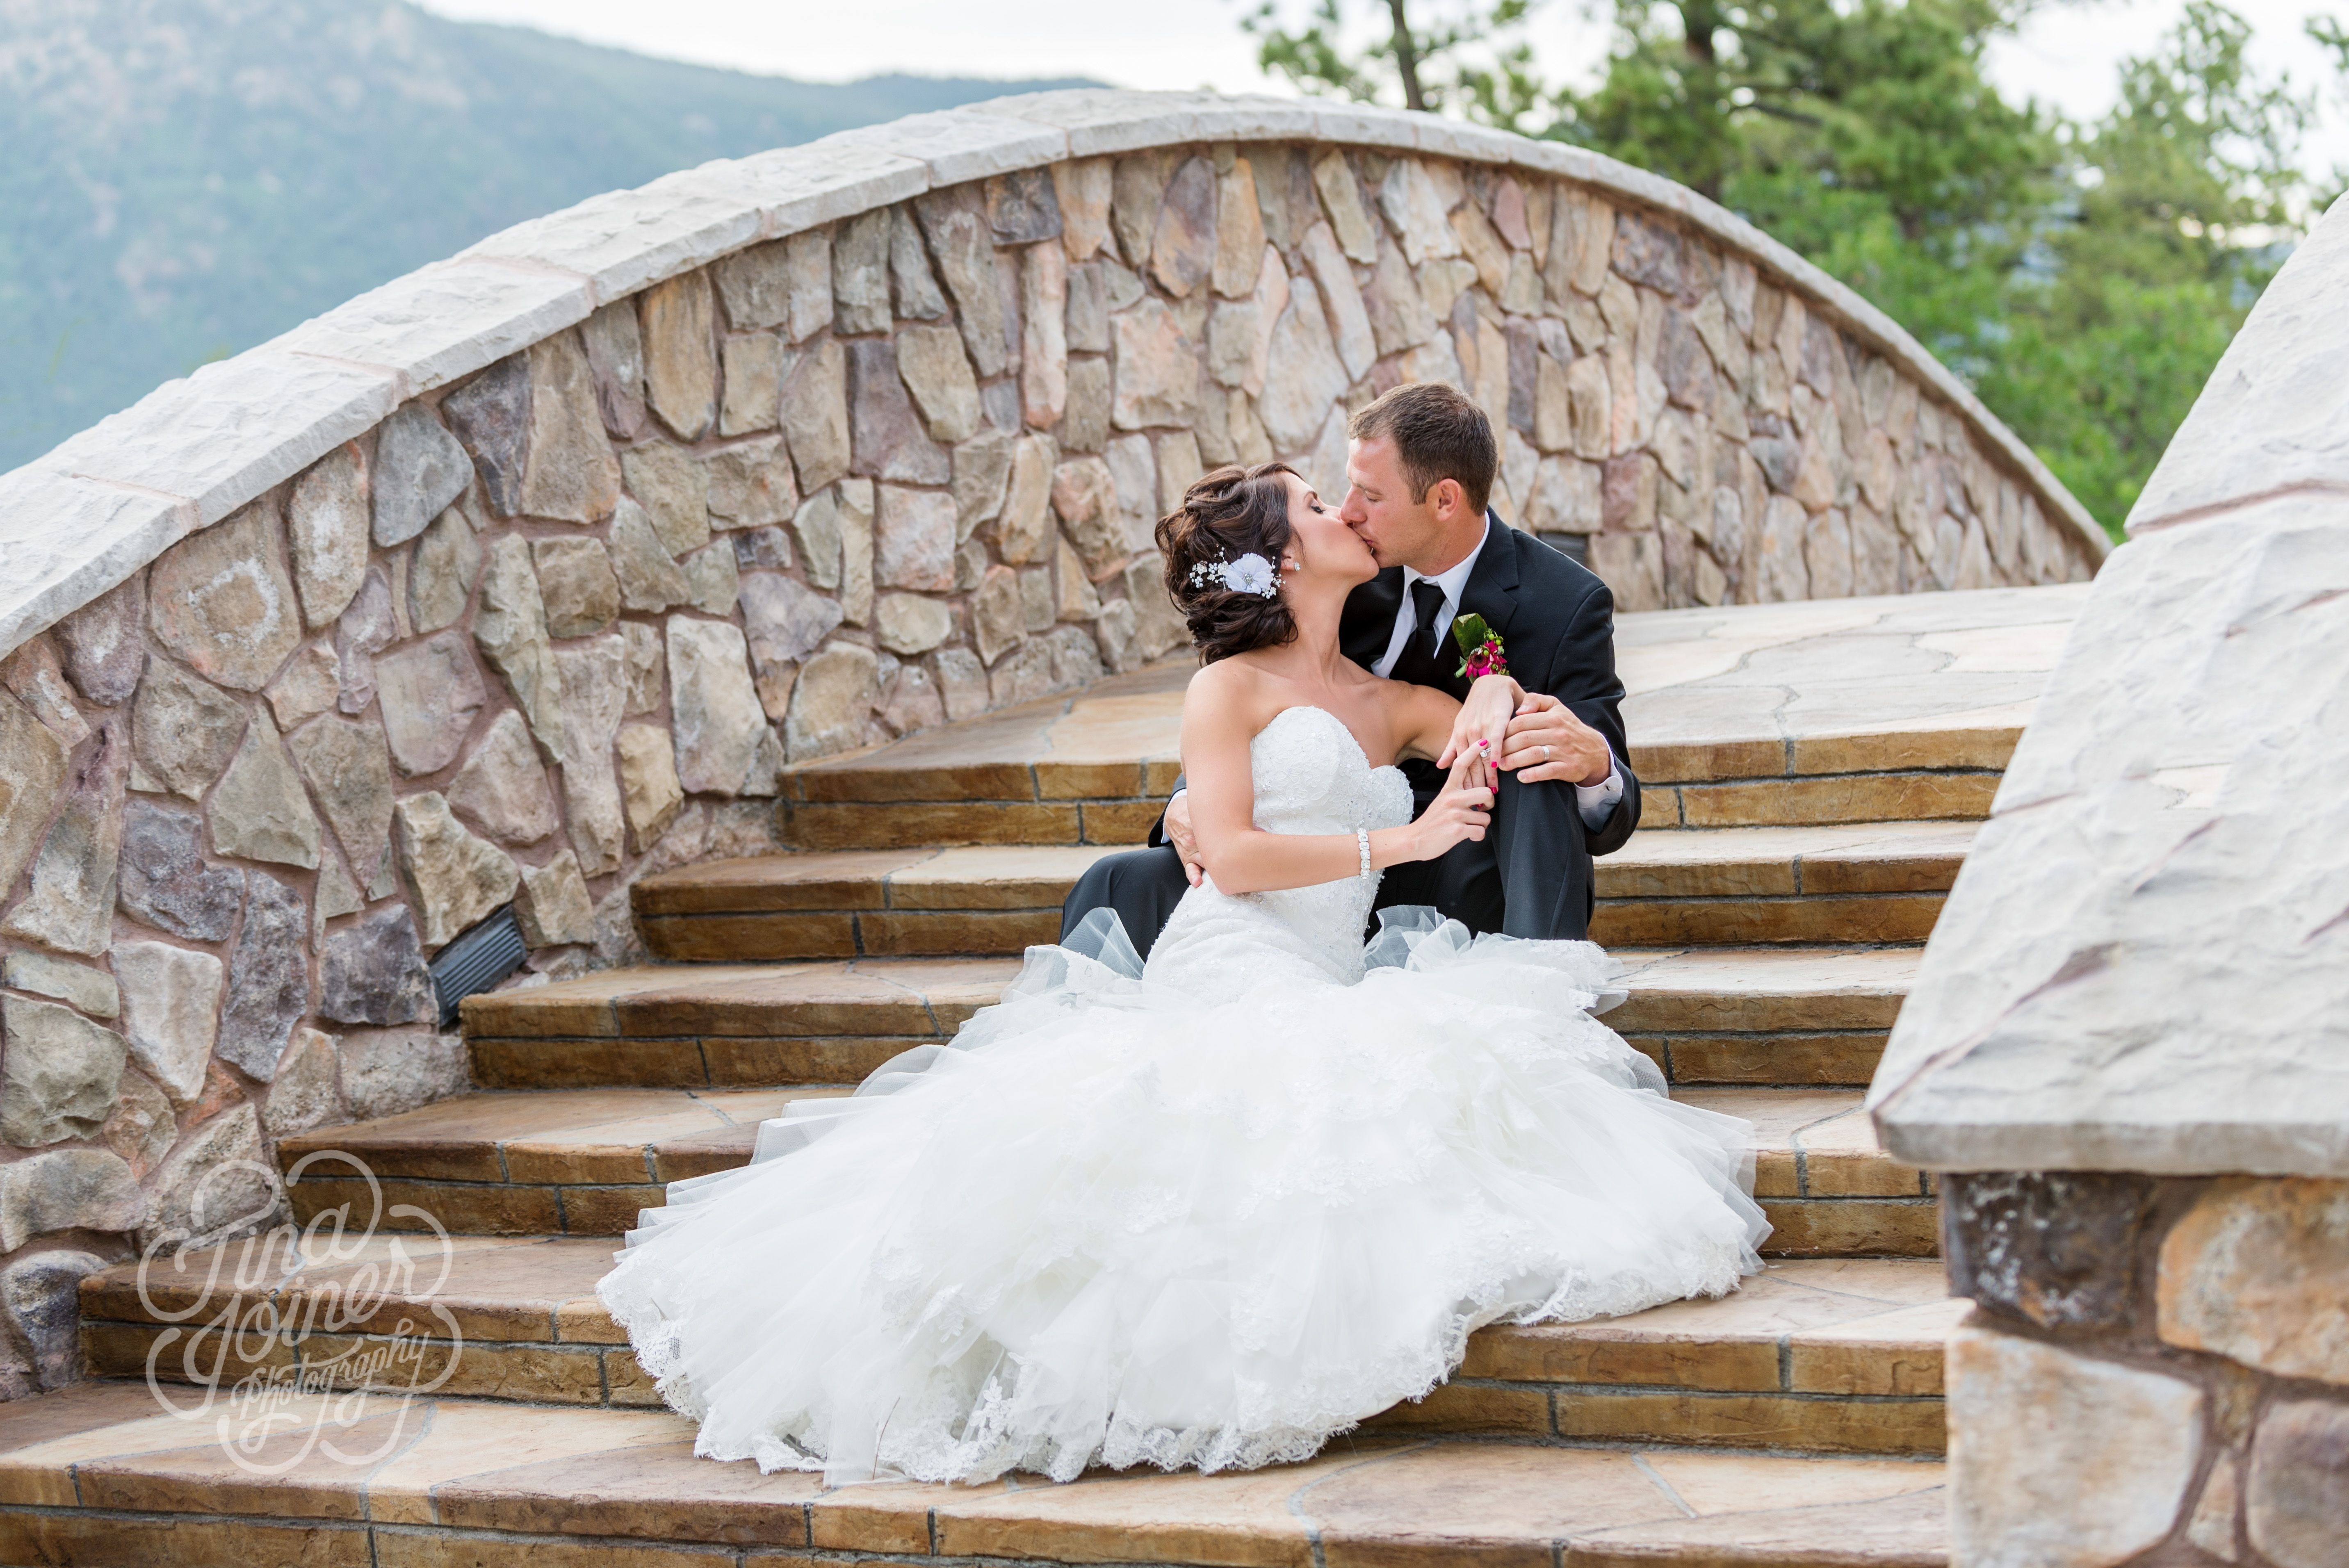 Colorado and Destination Wedding Photographer Tina